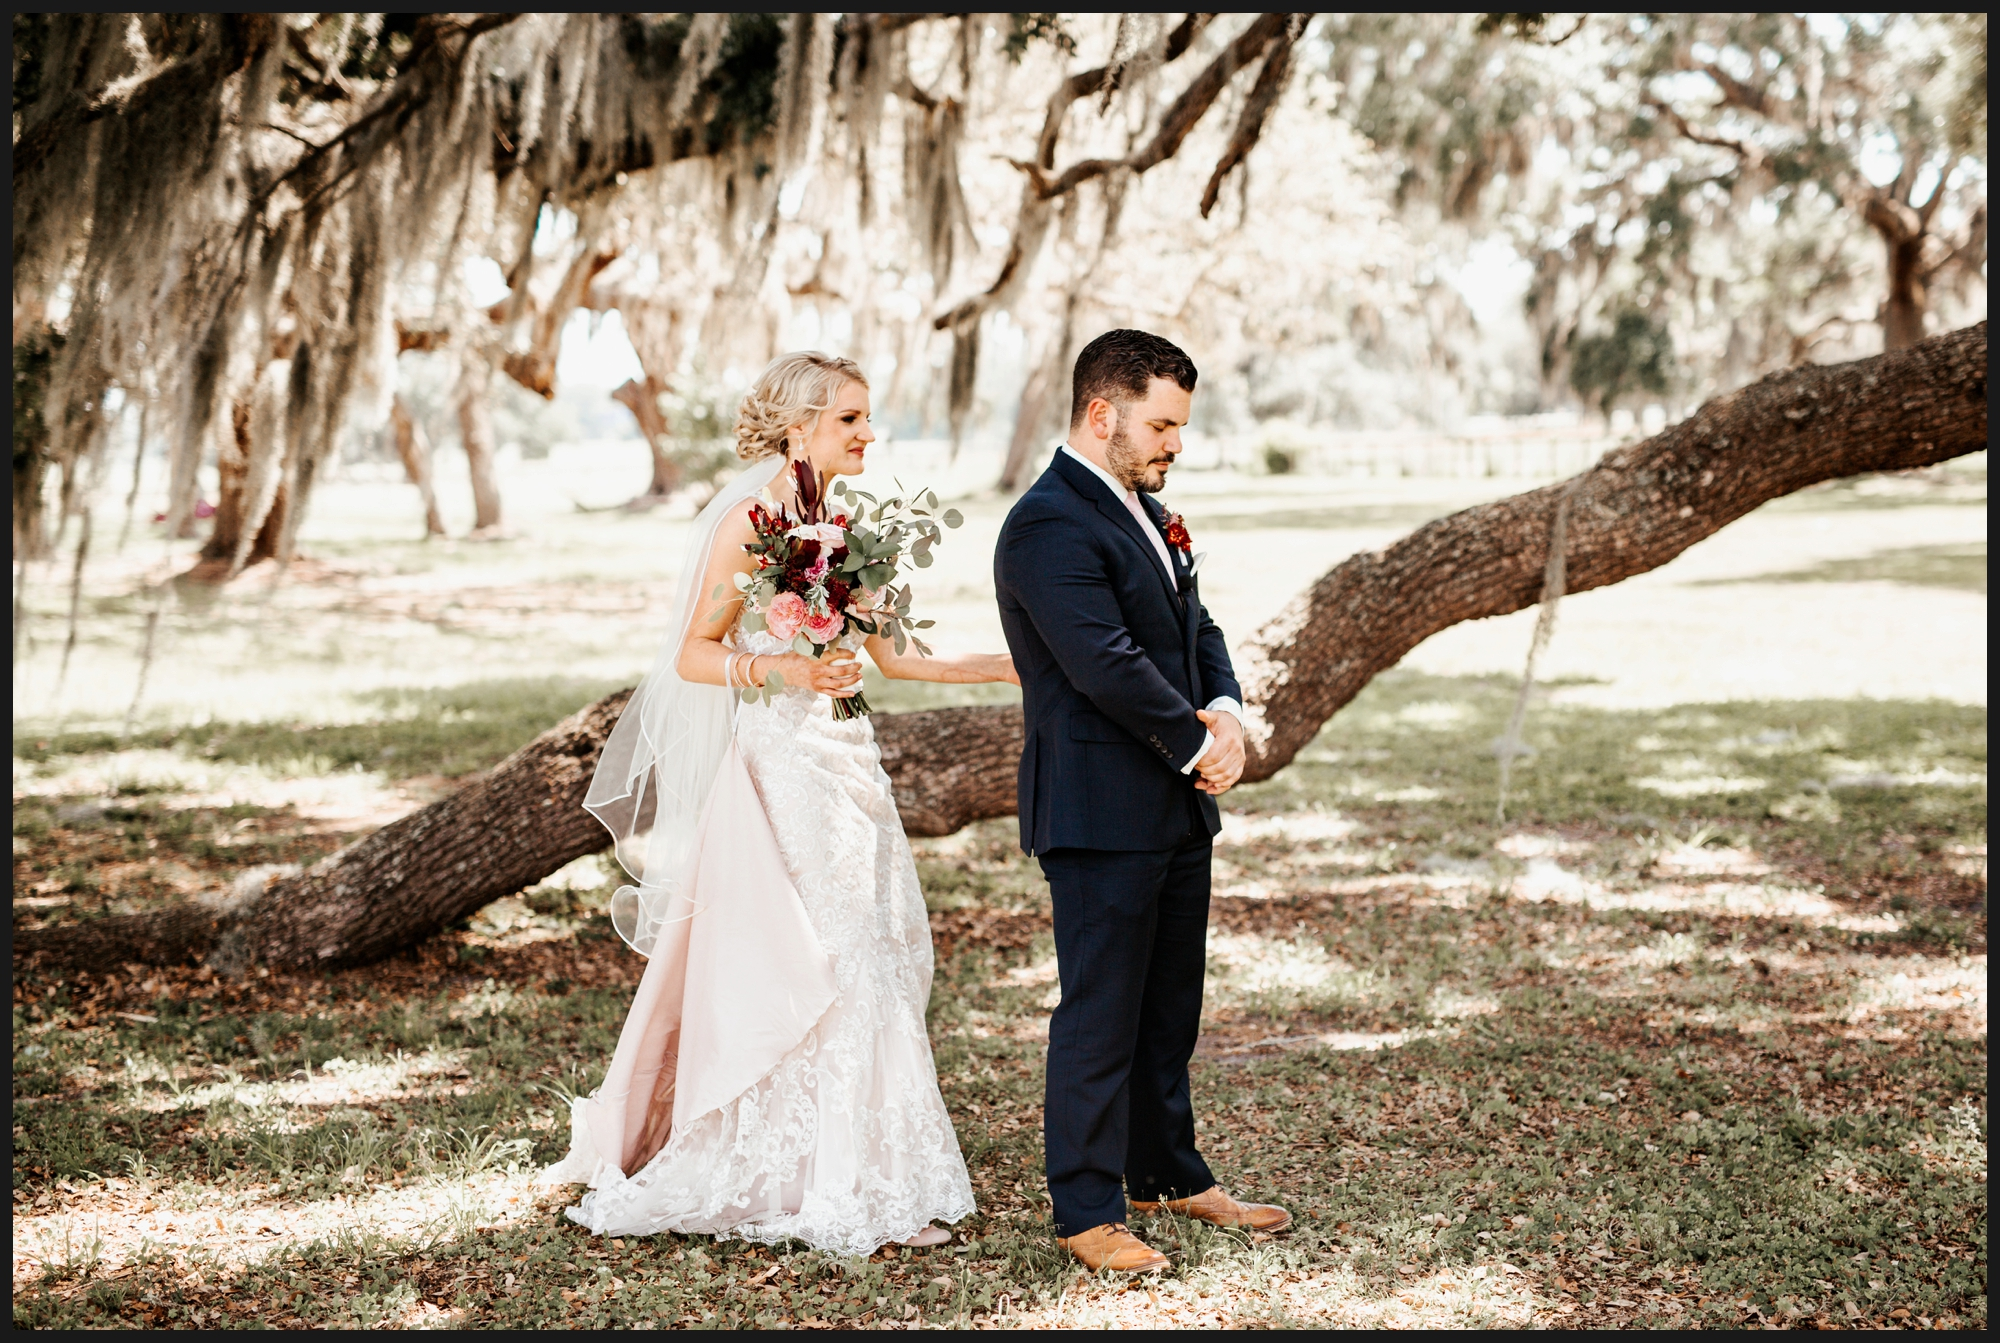 Orlando-Wedding-Photographer-destination-wedding-photographer-florida-wedding-photographer-hawaii-wedding-photographer_0575.jpg